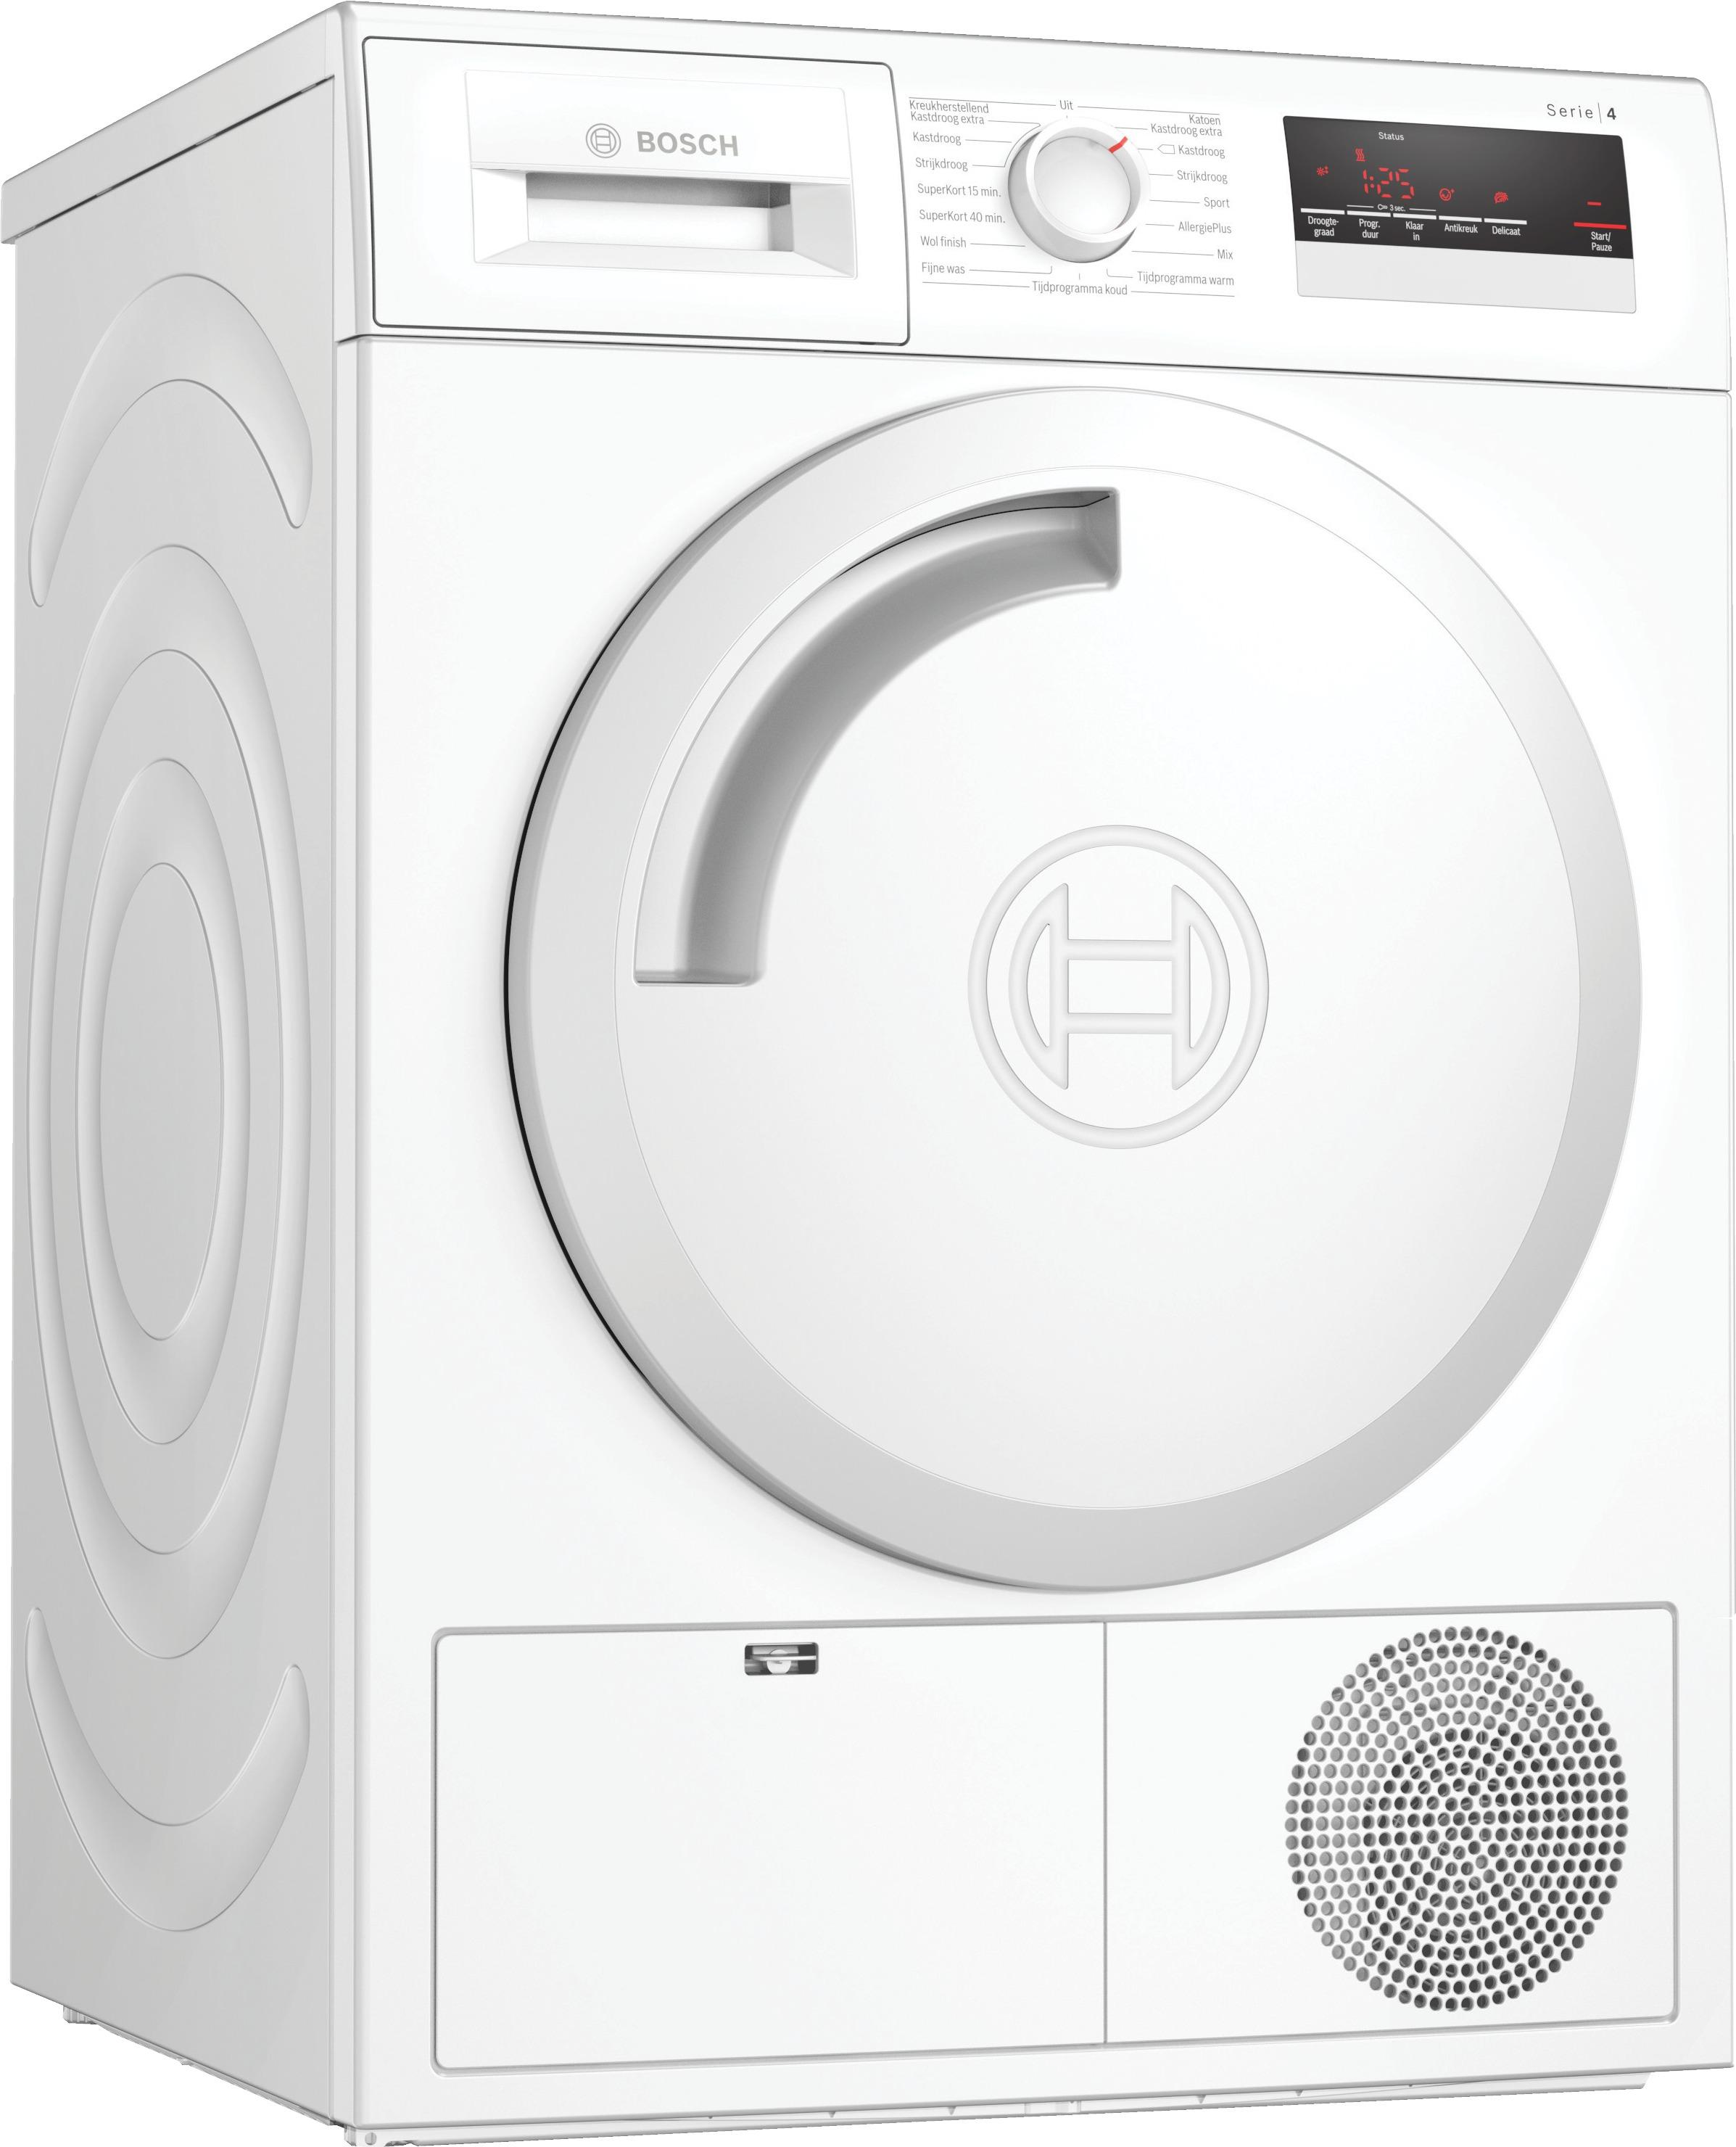 Bosch condensdroger WTN83202NL kopen